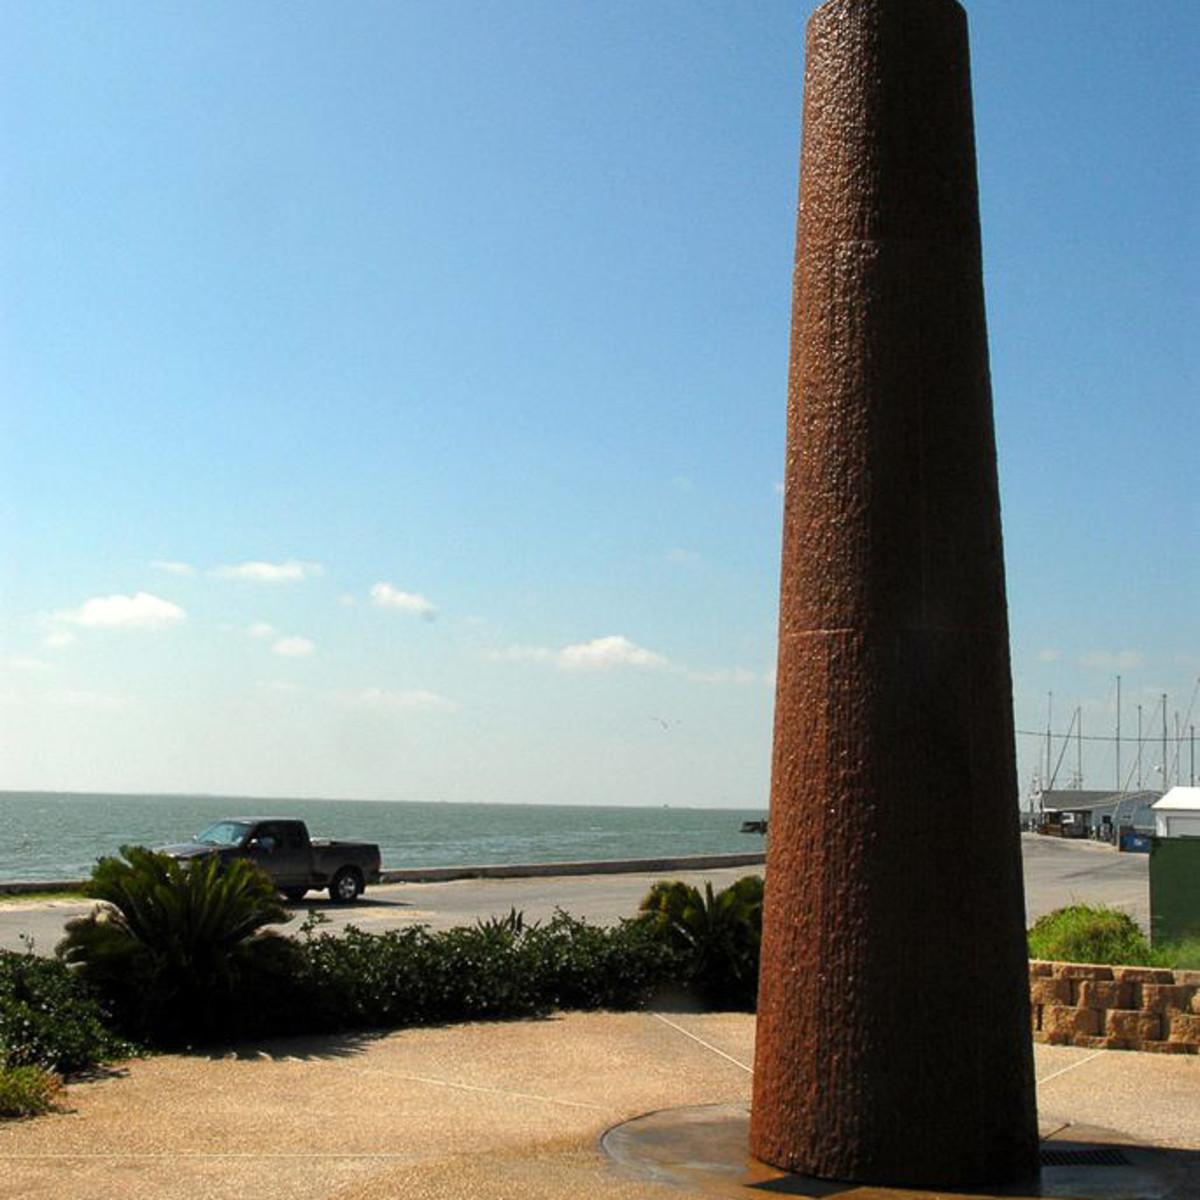 News_Steven Thomson_Gulf art_Rockport Center for the Arts_Jesus Bautista Moroles_sculpture